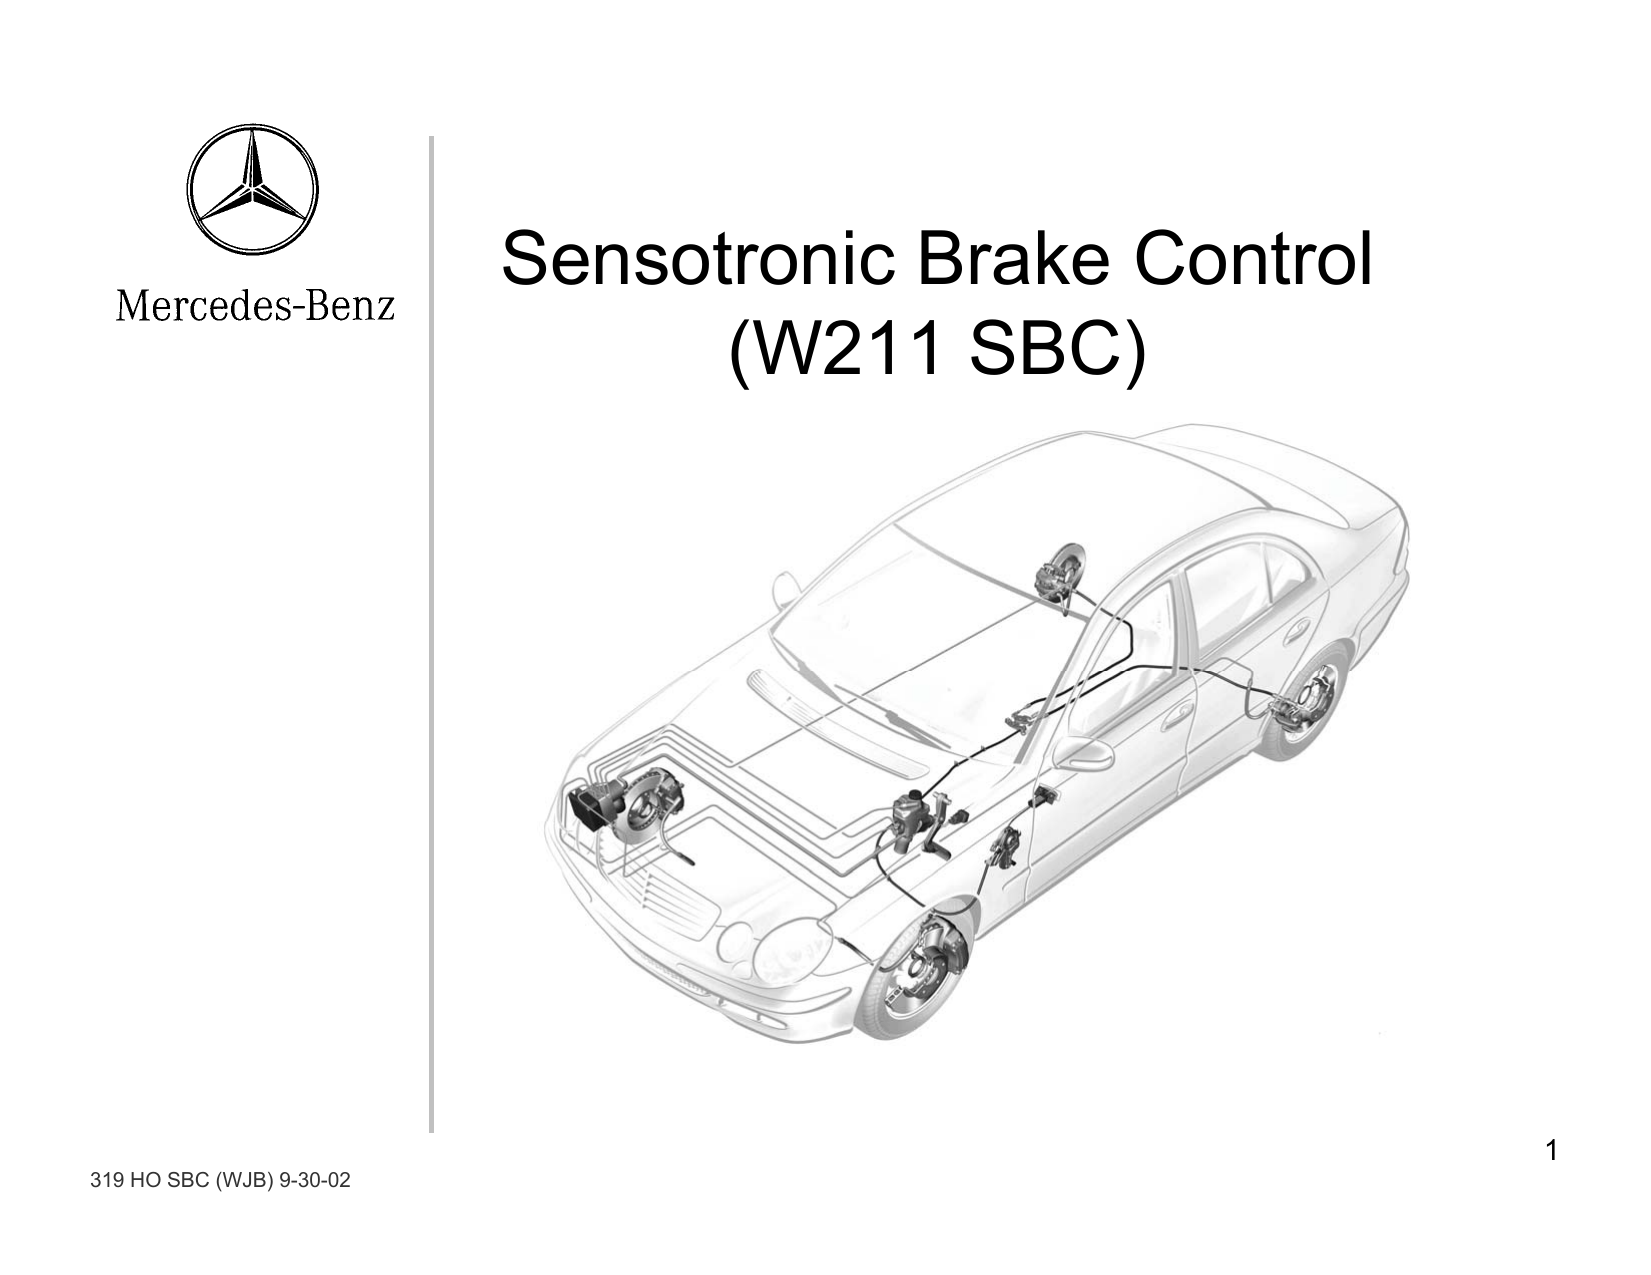 hight resolution of sensotronic brake control